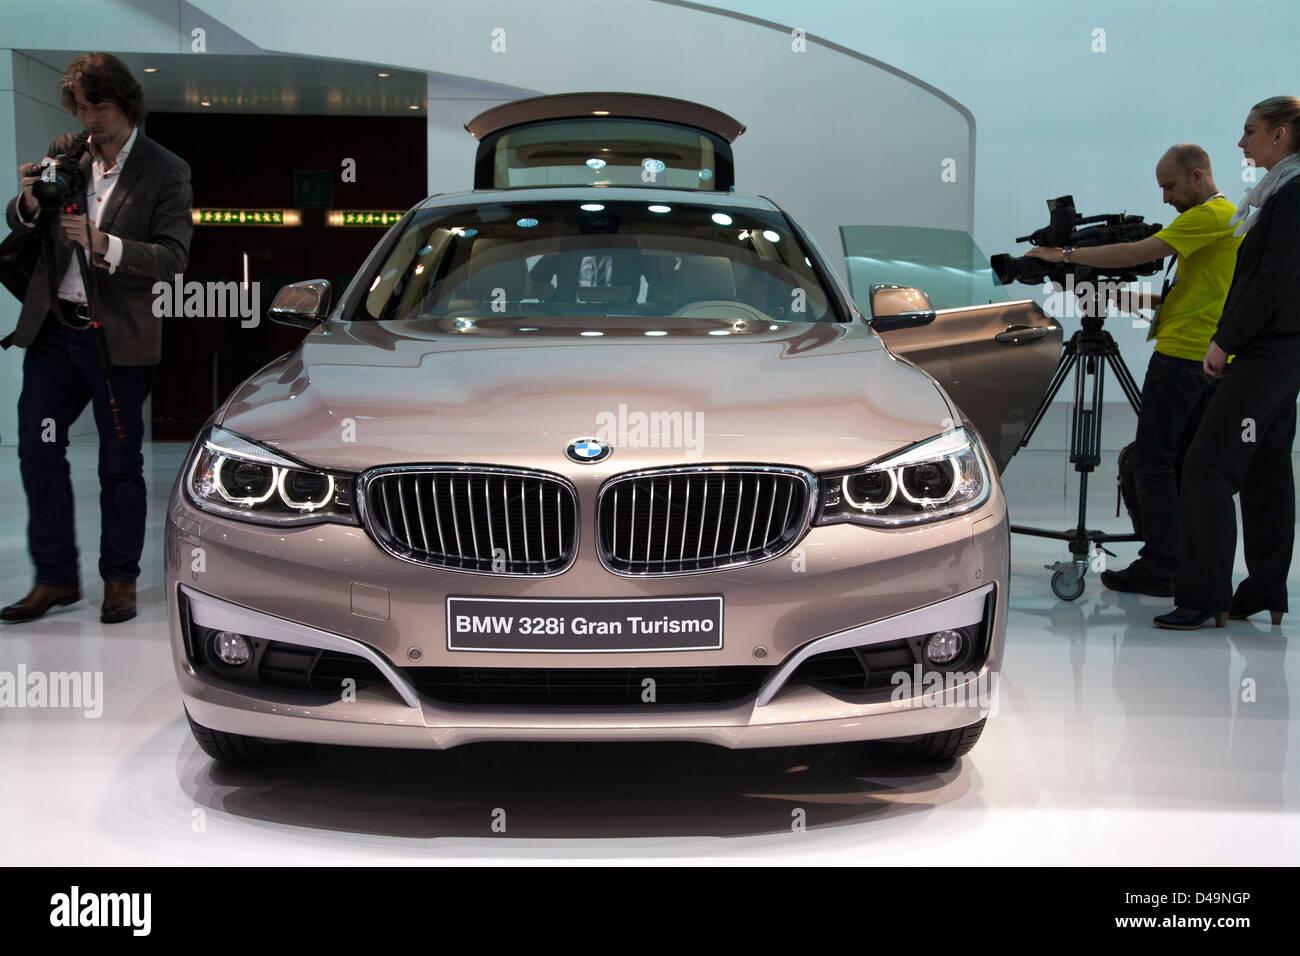 BMW 328i Gran Turismo. Geneva Motor Sow 2013 - Stock Image